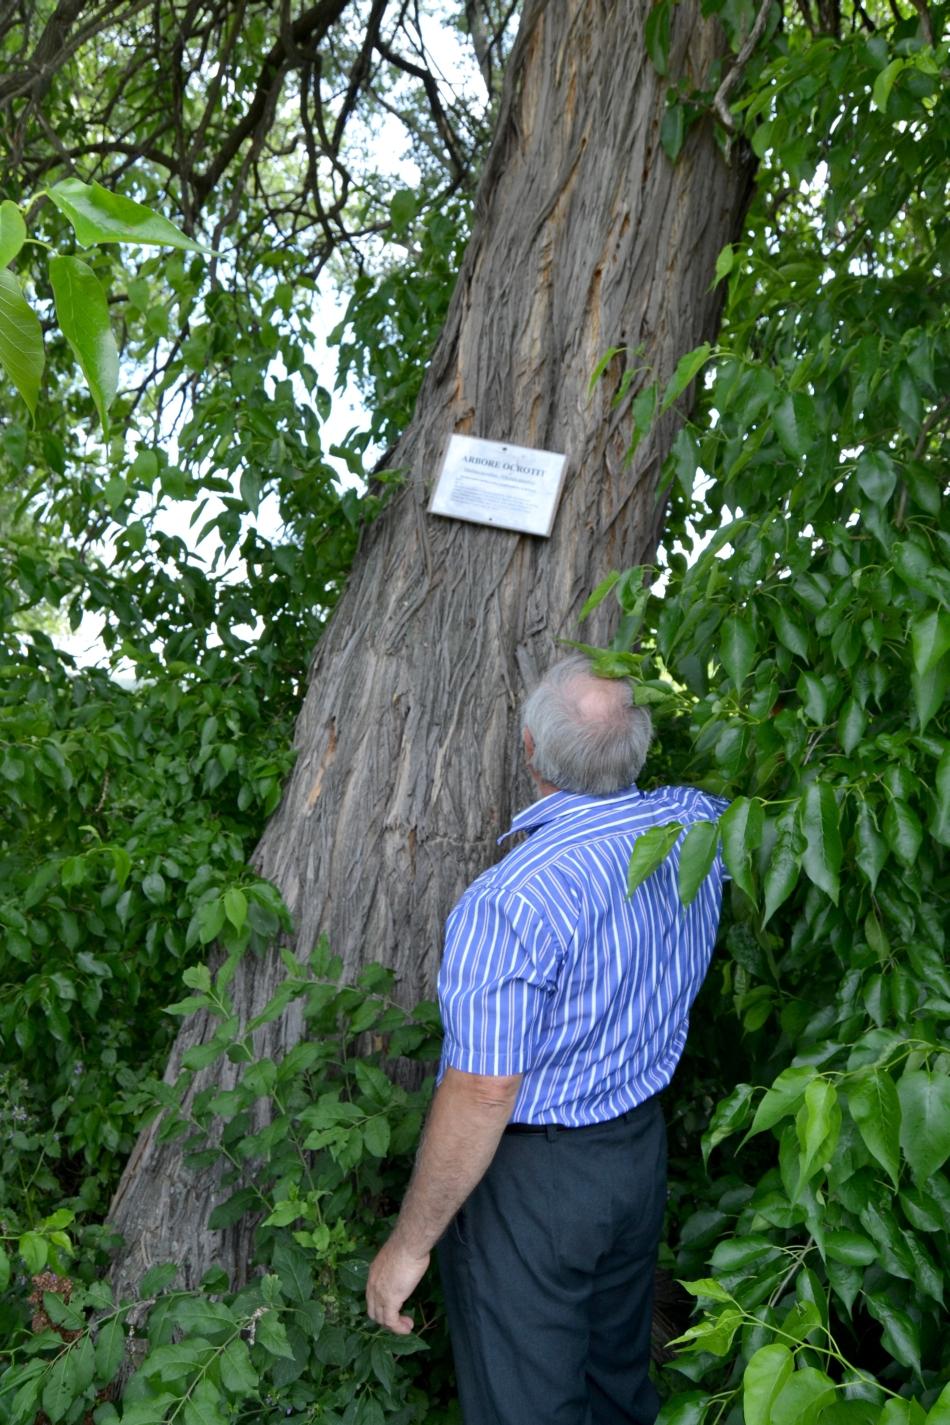 Un copac ornamental, numit popular portocal fals, poate fi vazut in satul iesean Medeleni din comuna Golaesti, miercuri, 2 iulie 2014.